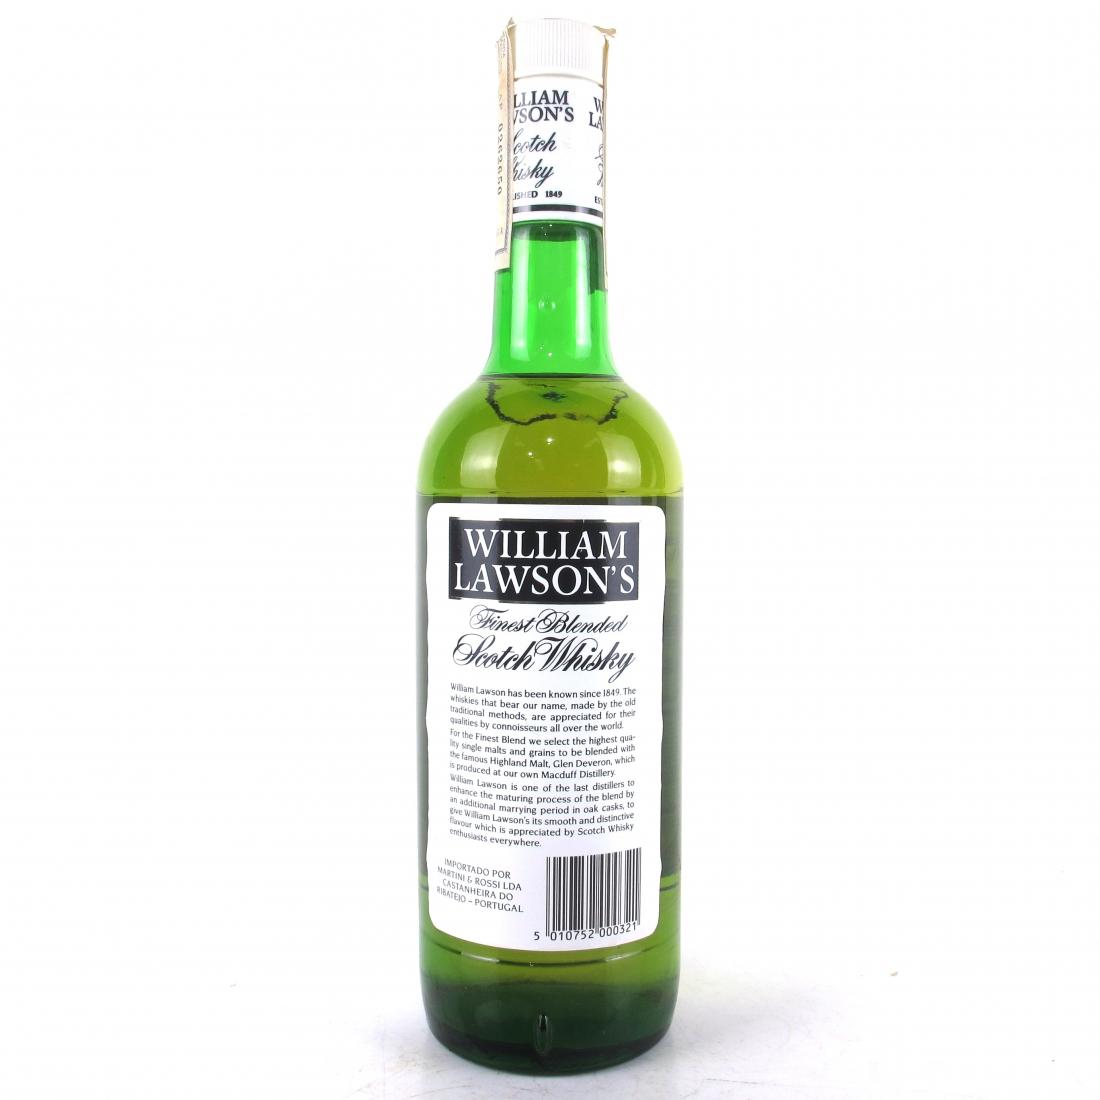 William Lawson's Finest Scotch Whisky 1980s / Martini & Rossi Import